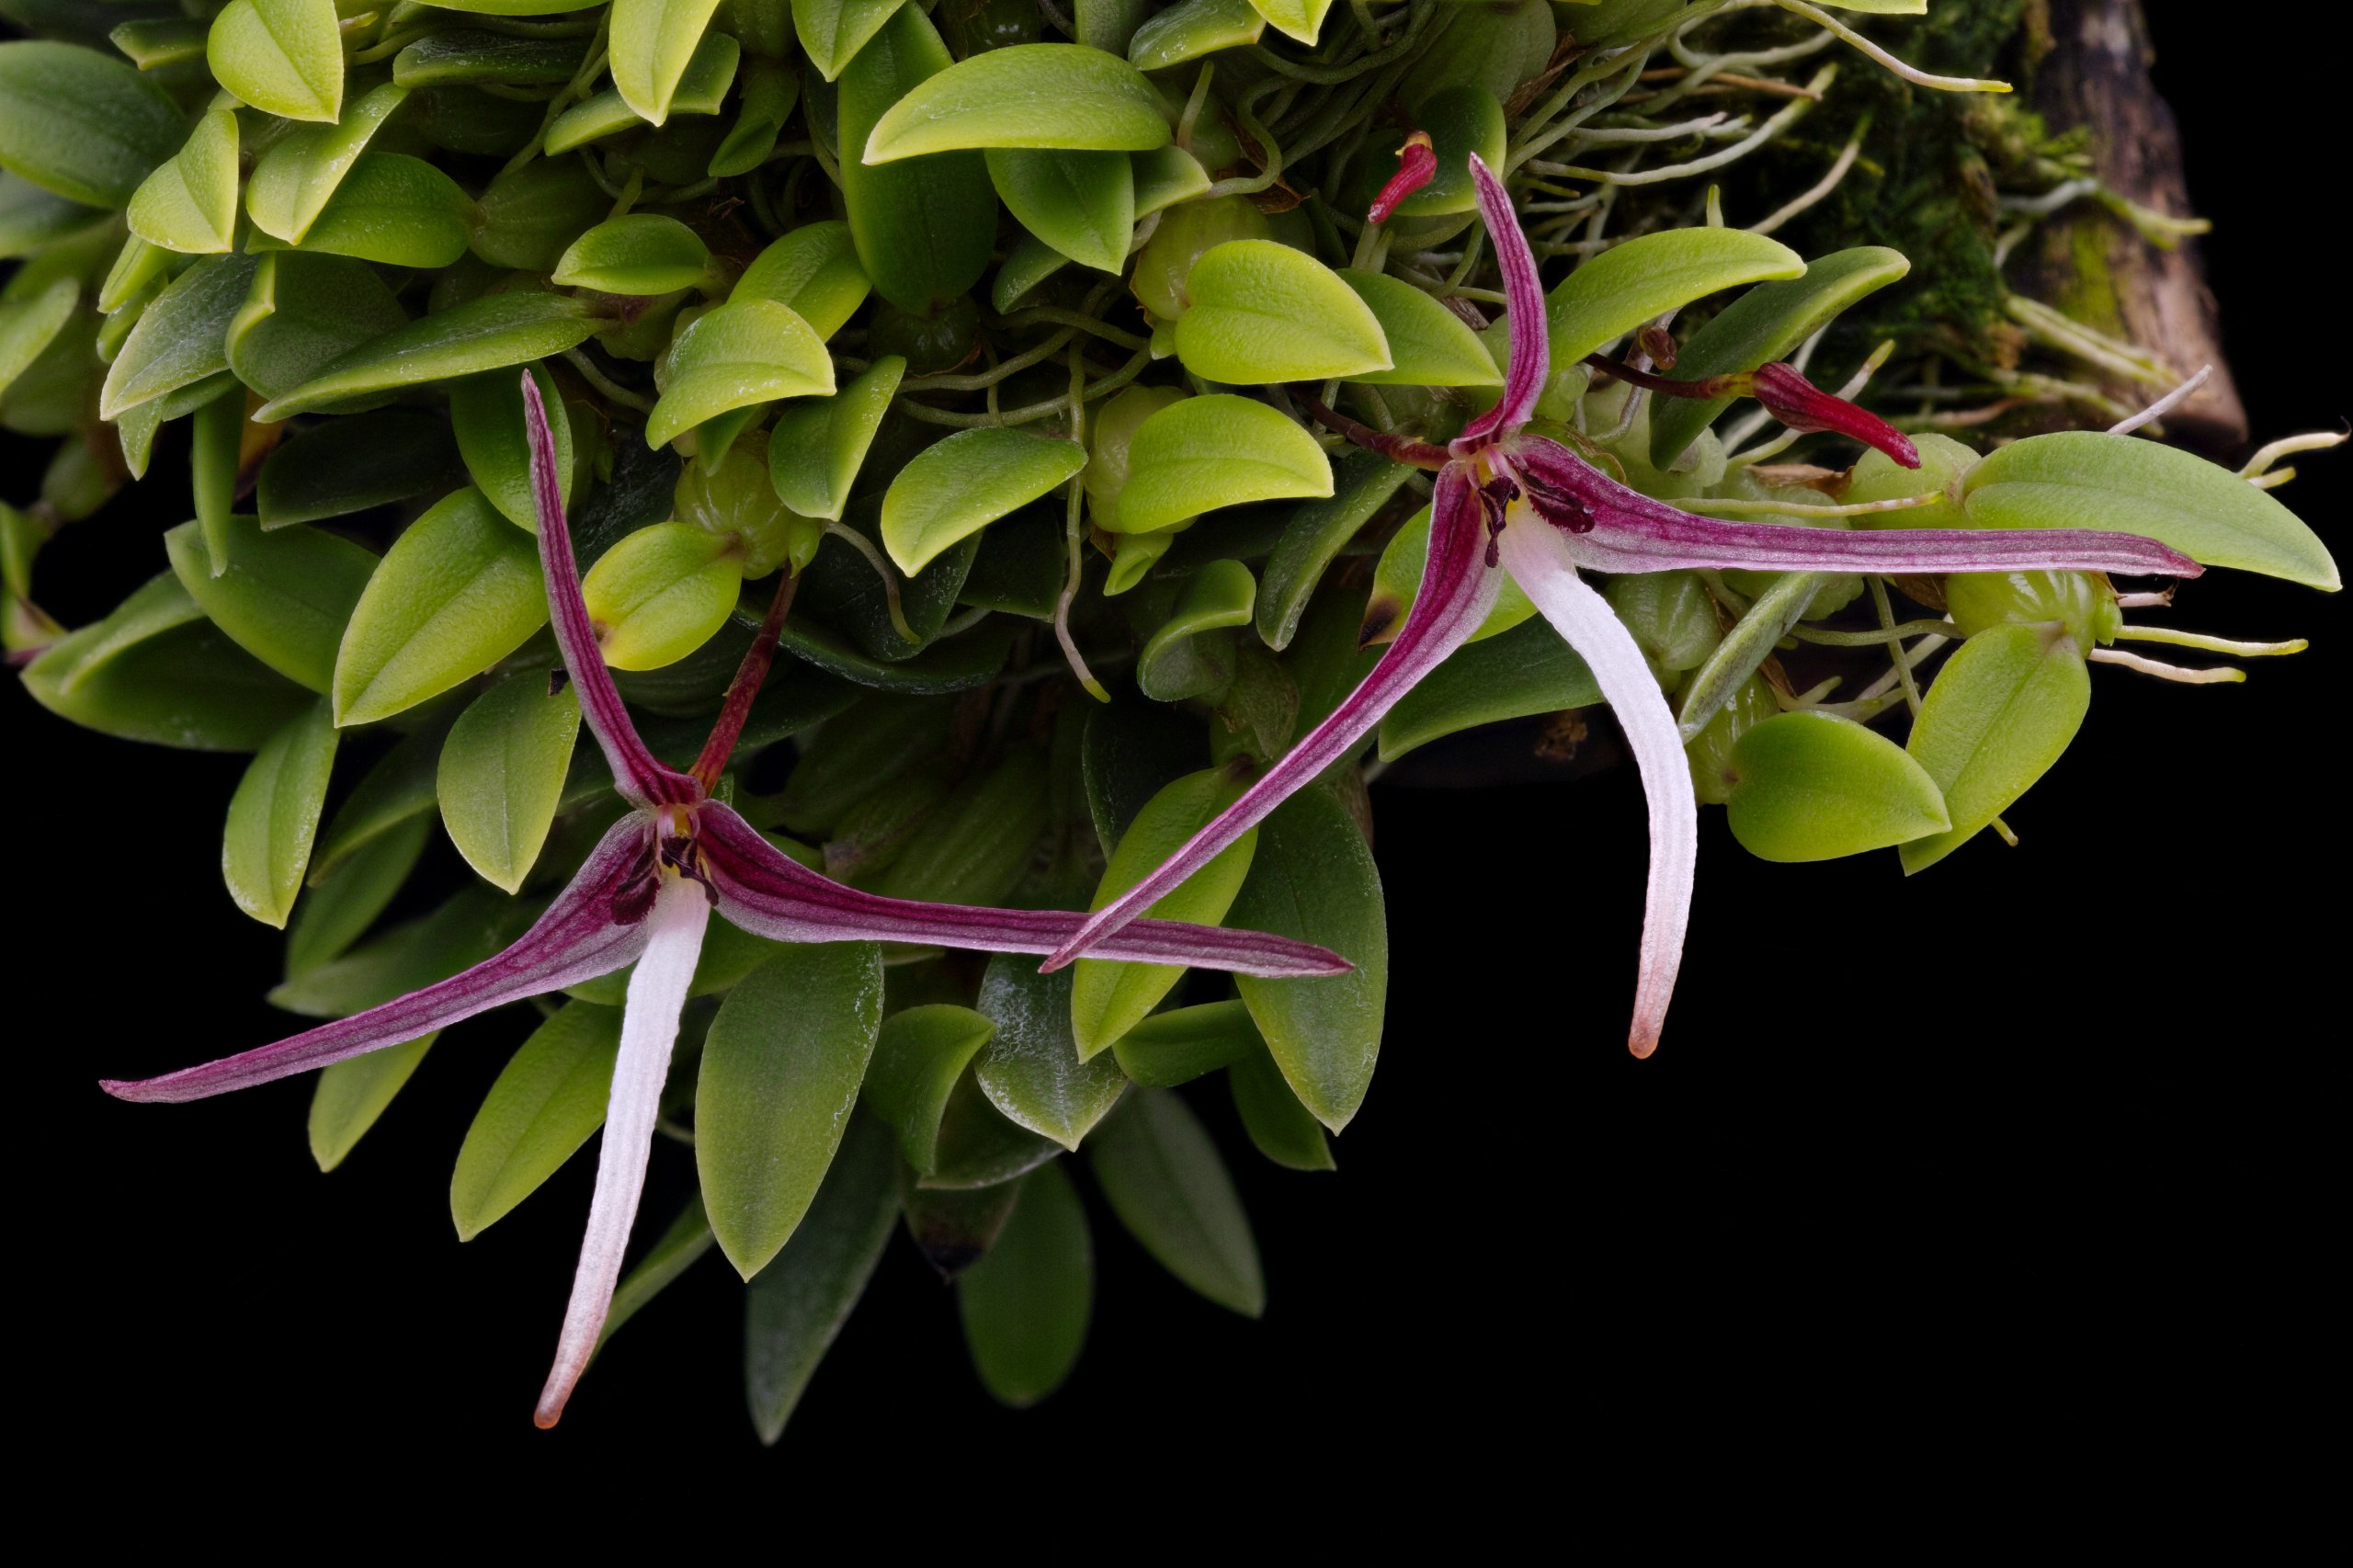 Bulbophyllum dolichoglottis flowers.jpg